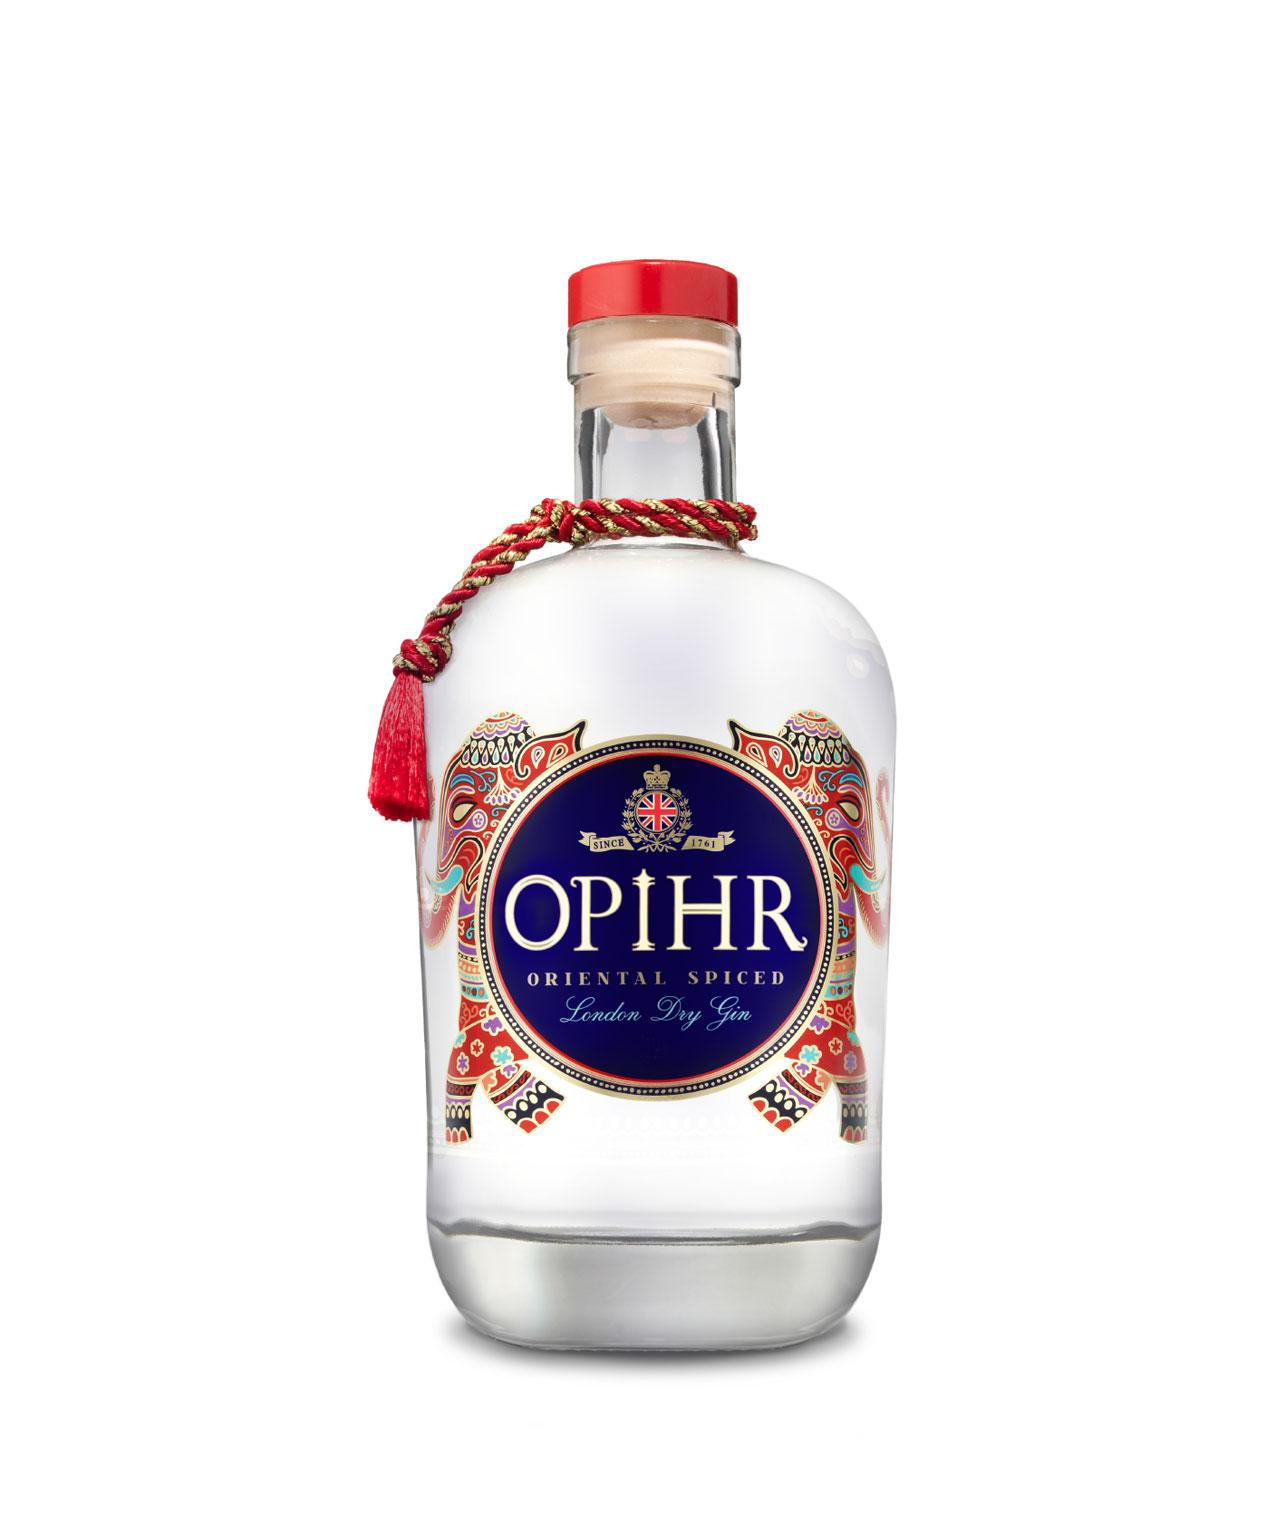 opihr oriental spiced gin quintessential brands group opihr oriental spiced gin